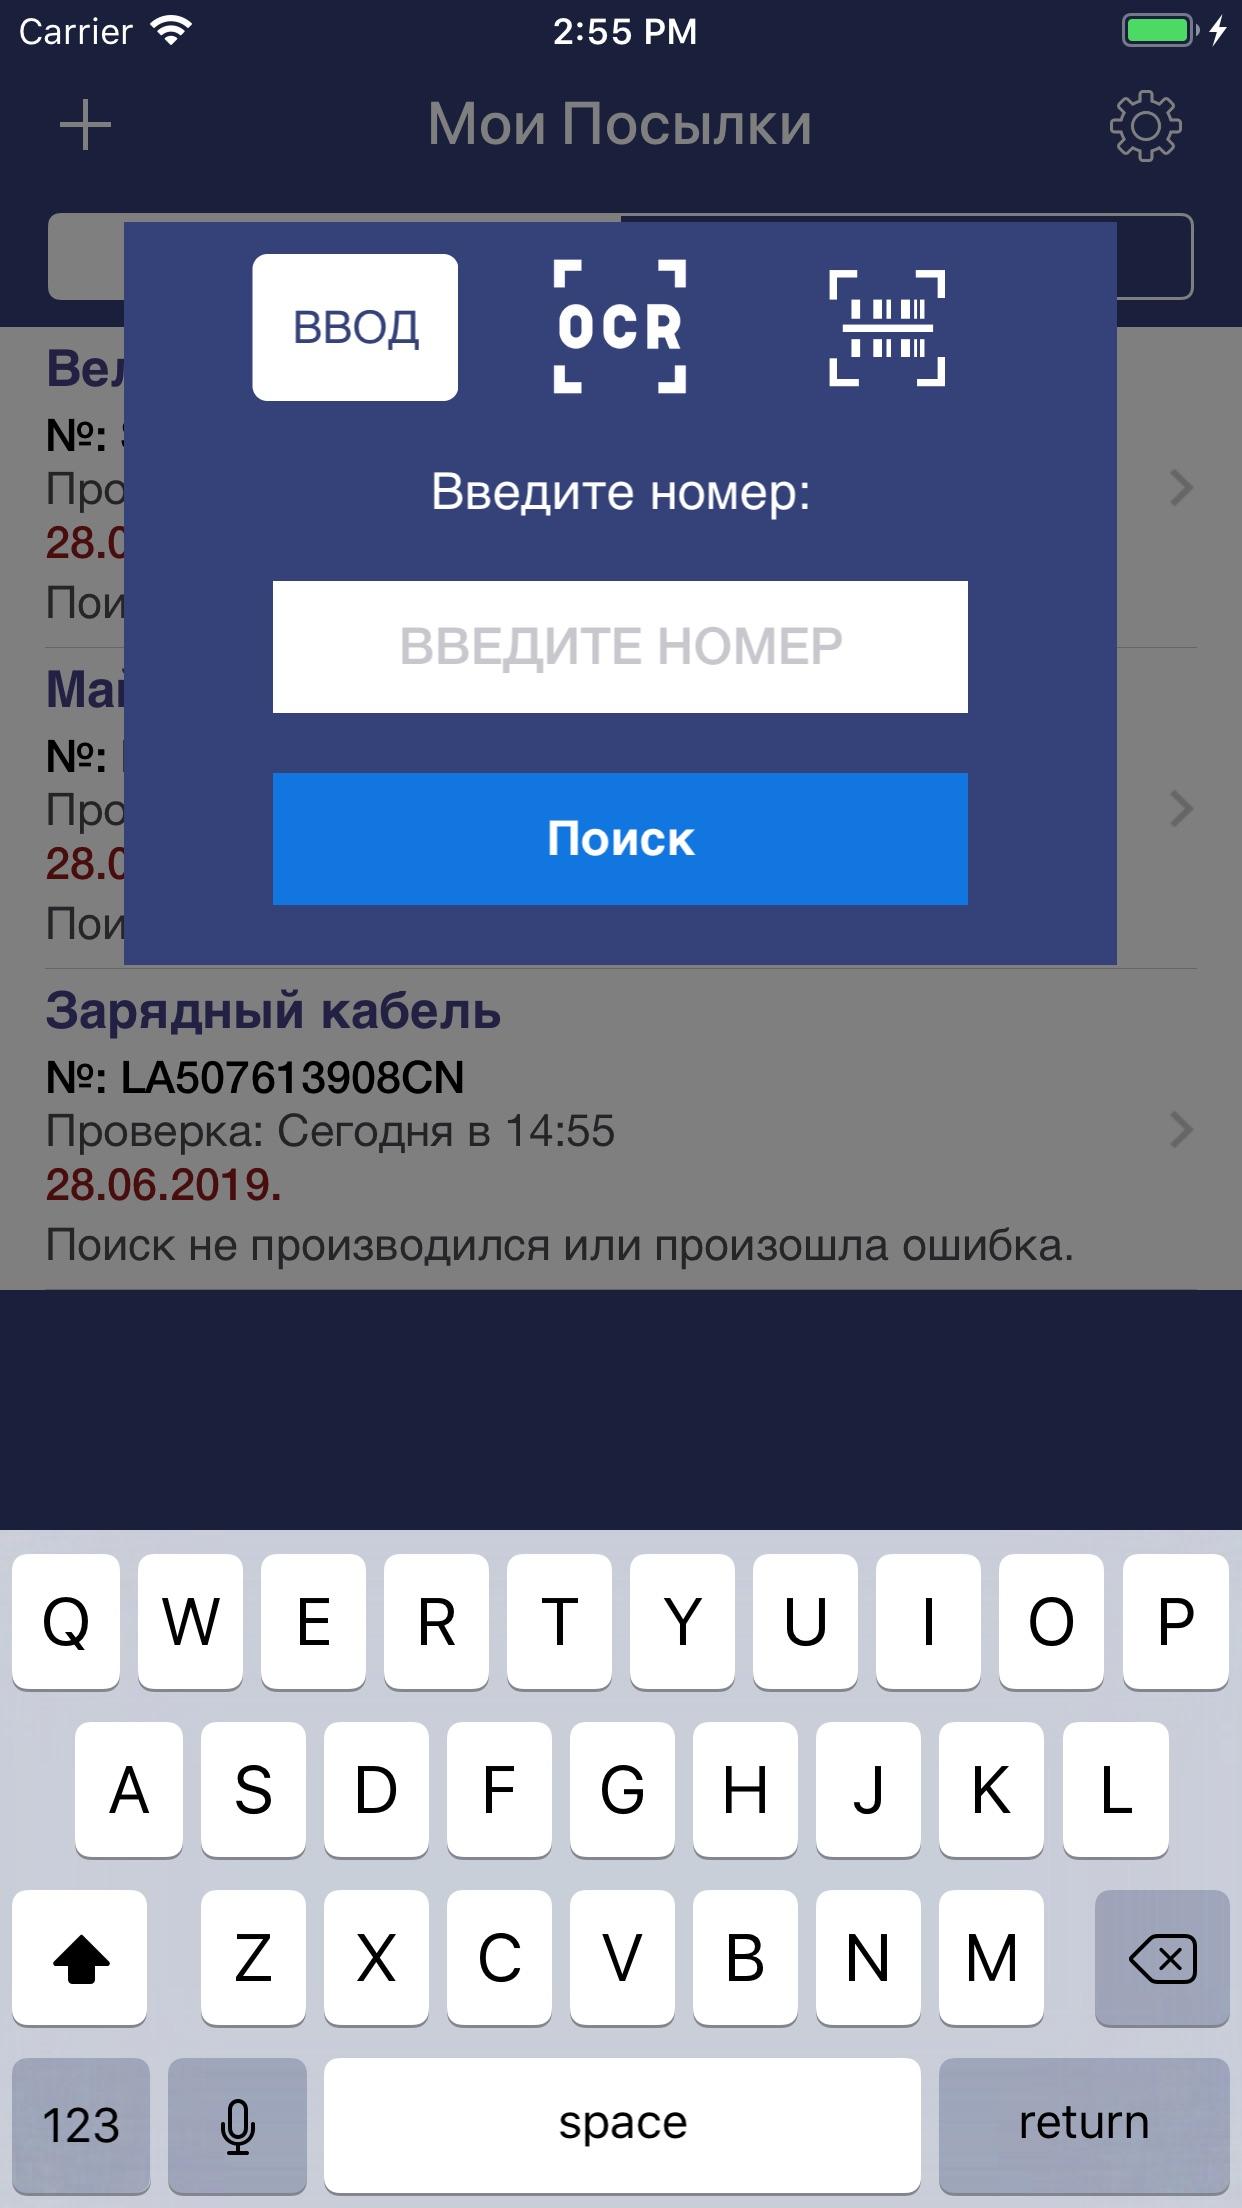 Мои посылки 'BY - Белпочта Screenshot